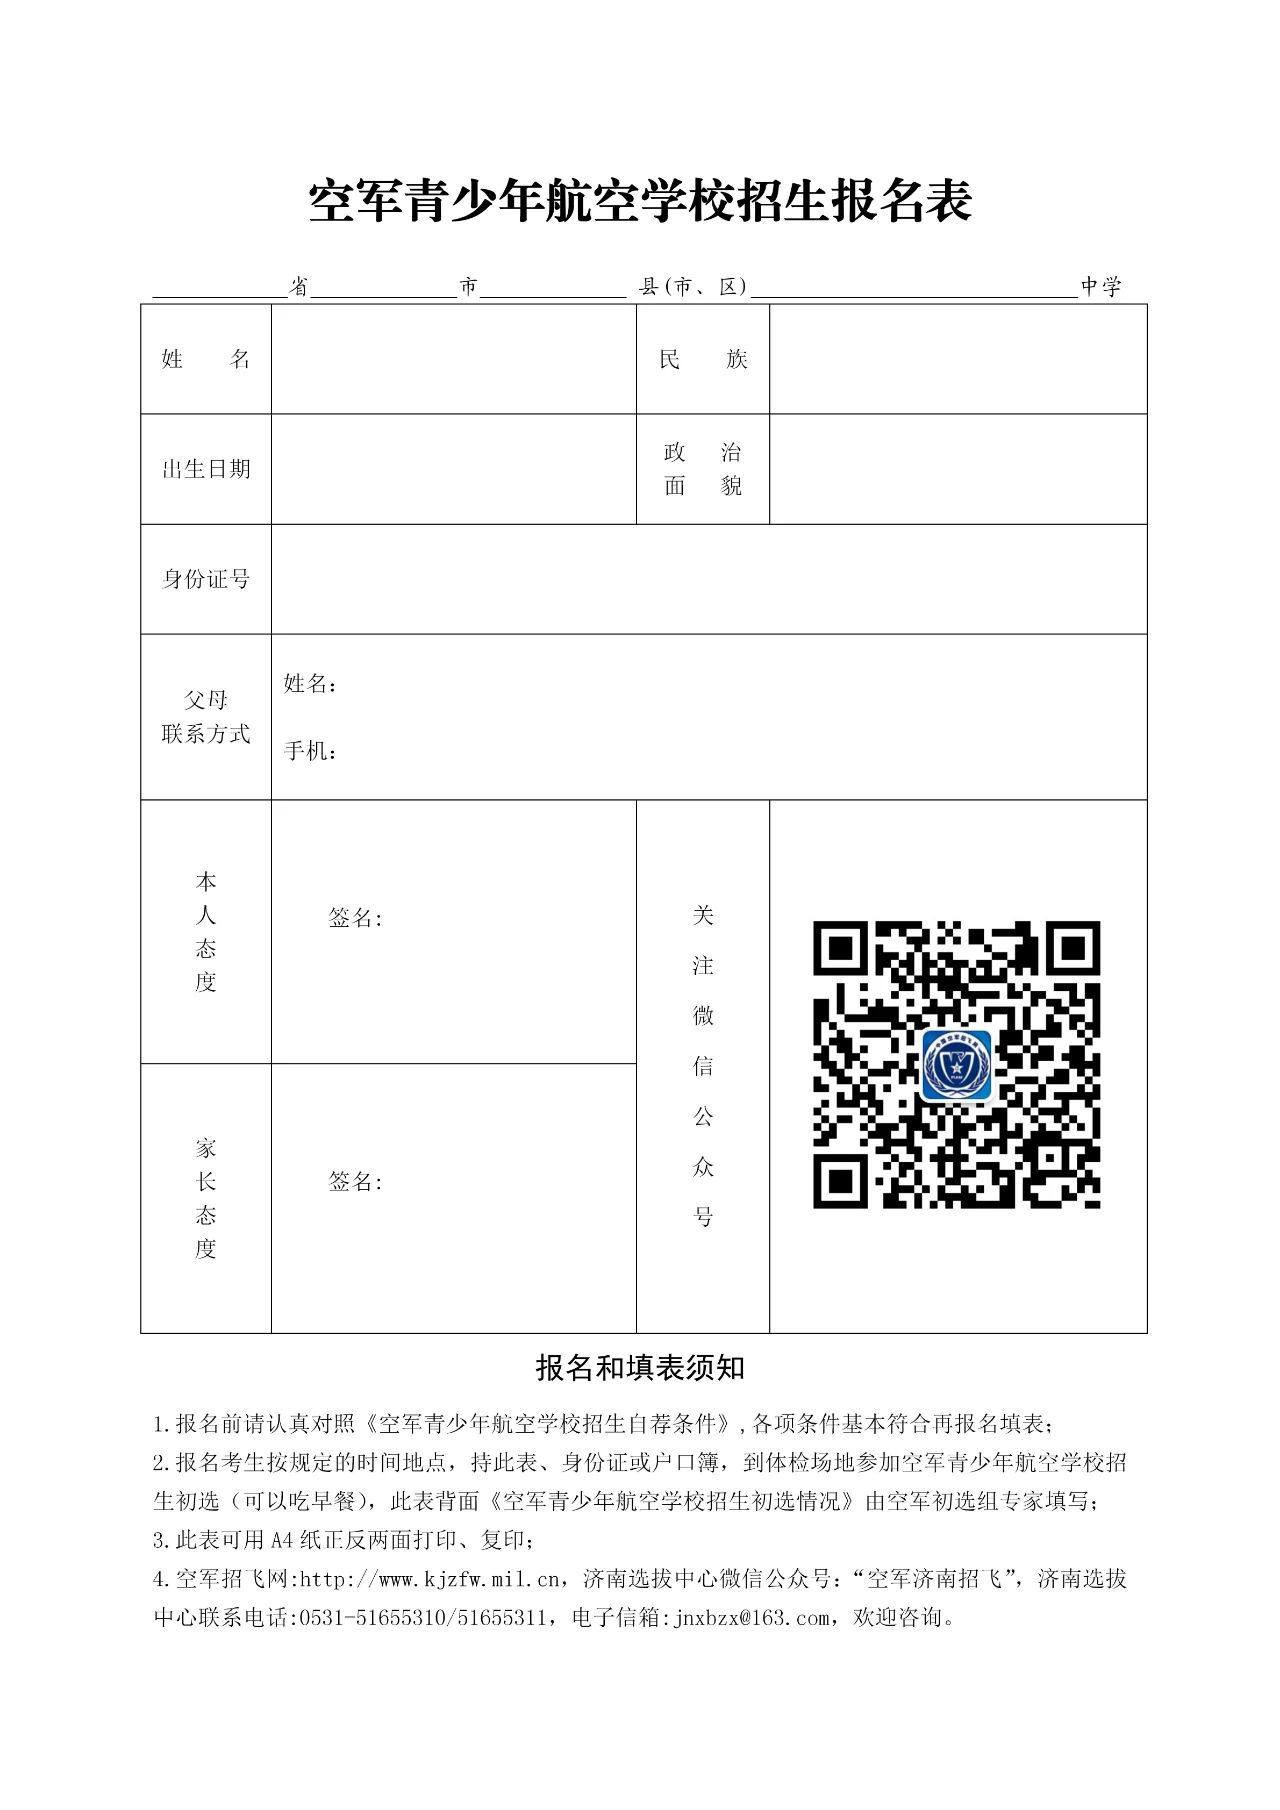 1ccc6332ae293aacfa4d10de52a6b15f.jpg